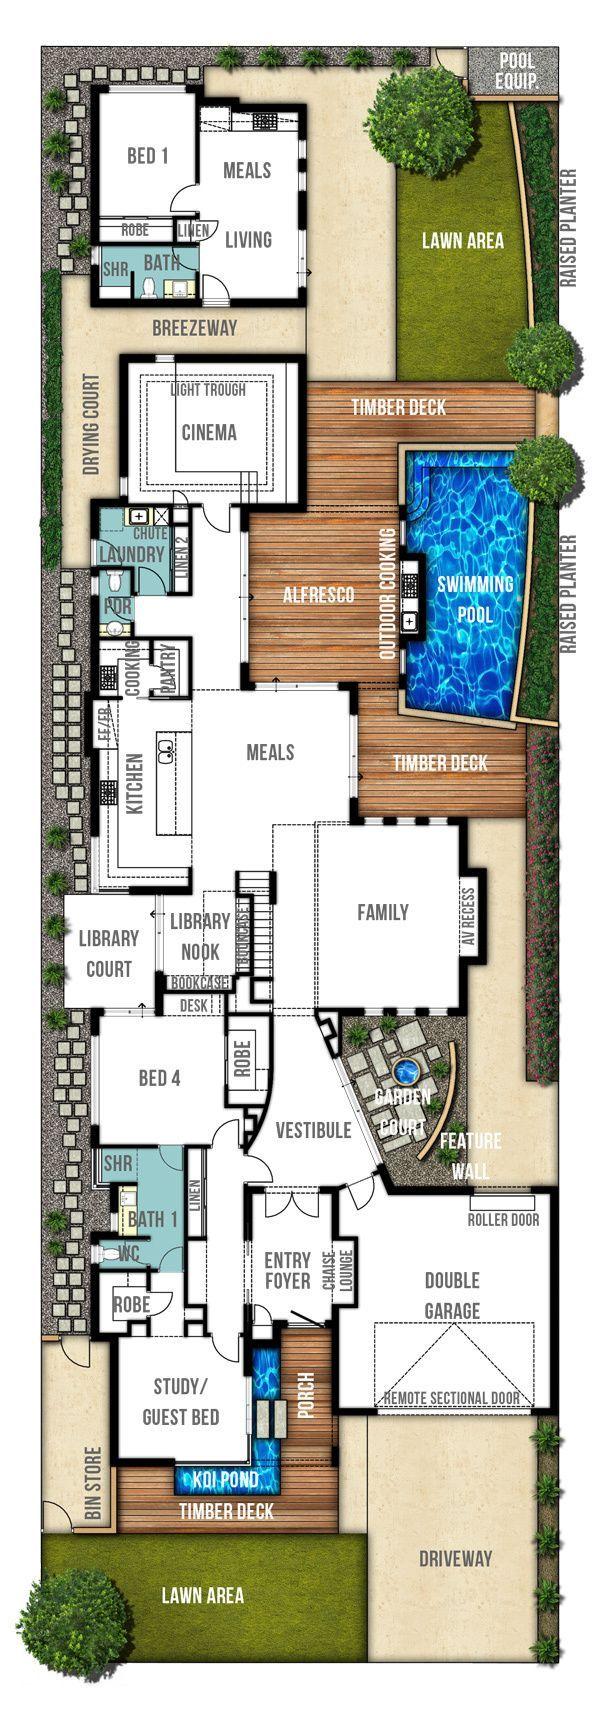 Two storey home plans ground floor design